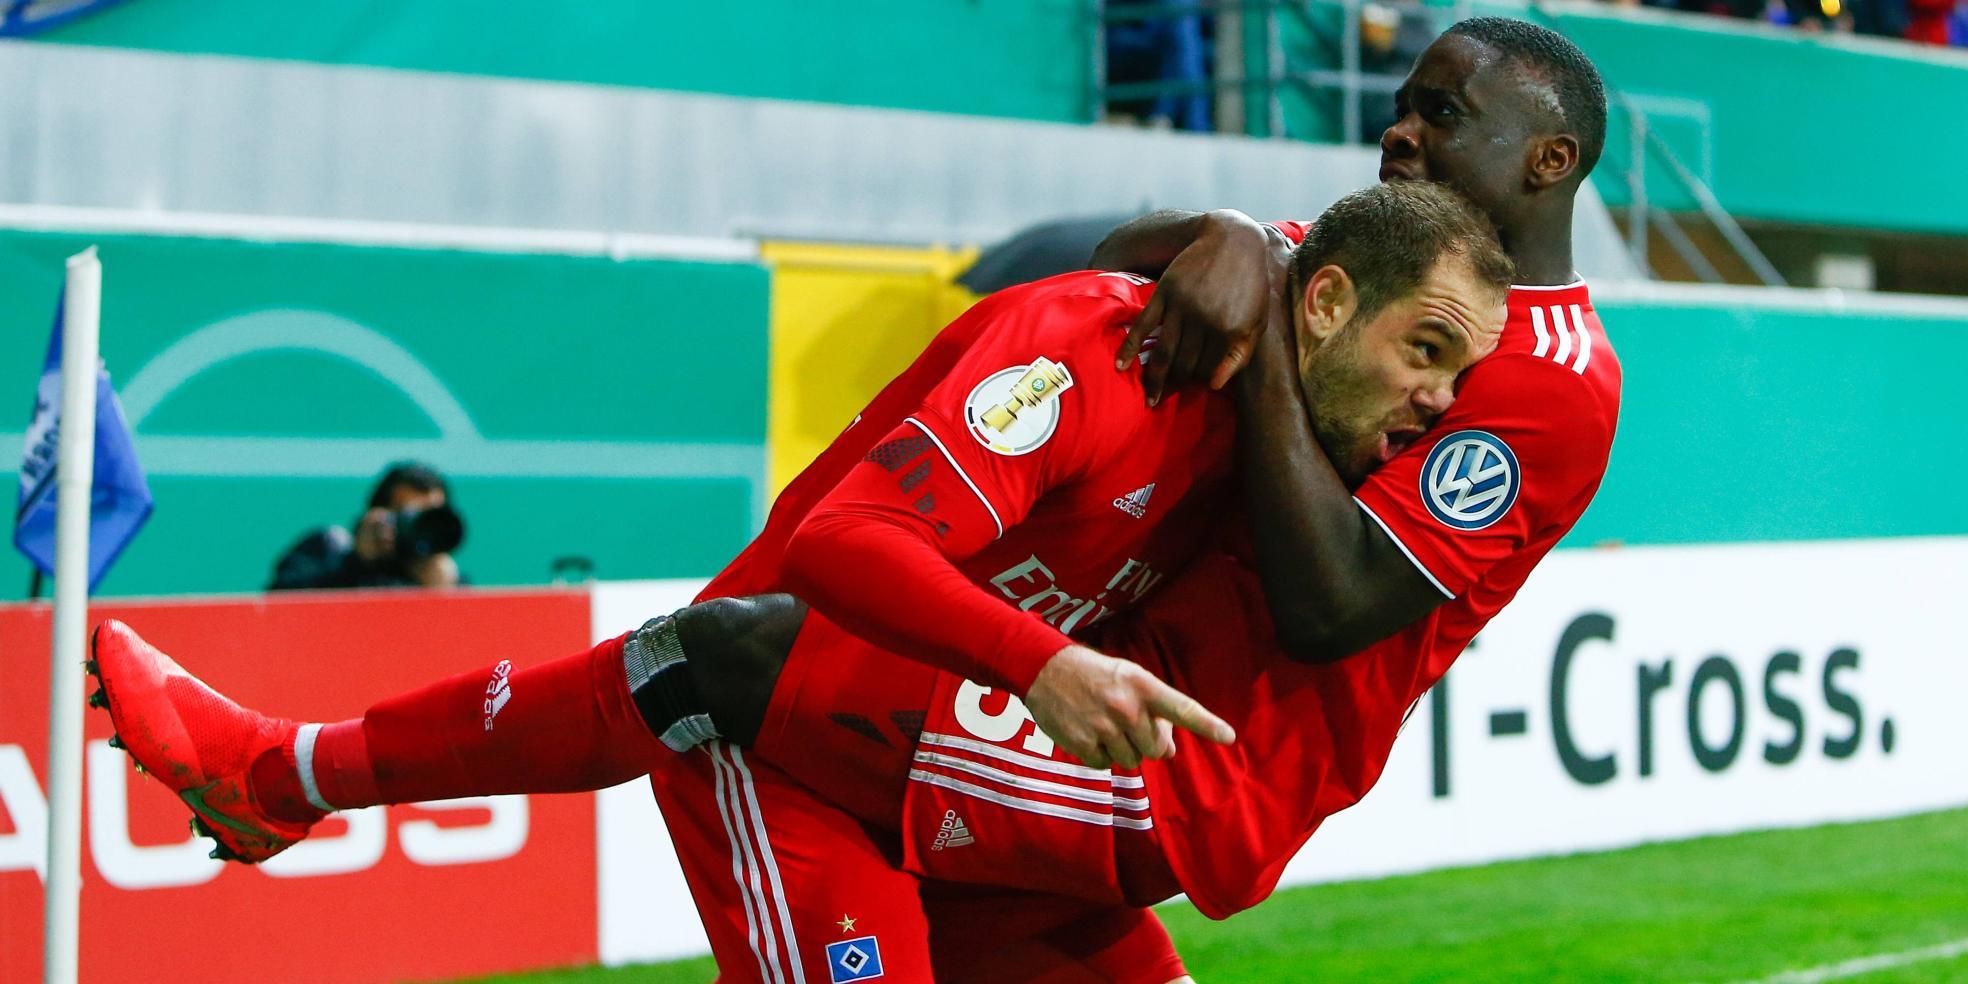 Pierre-Michael Lasogga und Orel Mangala vom HSV